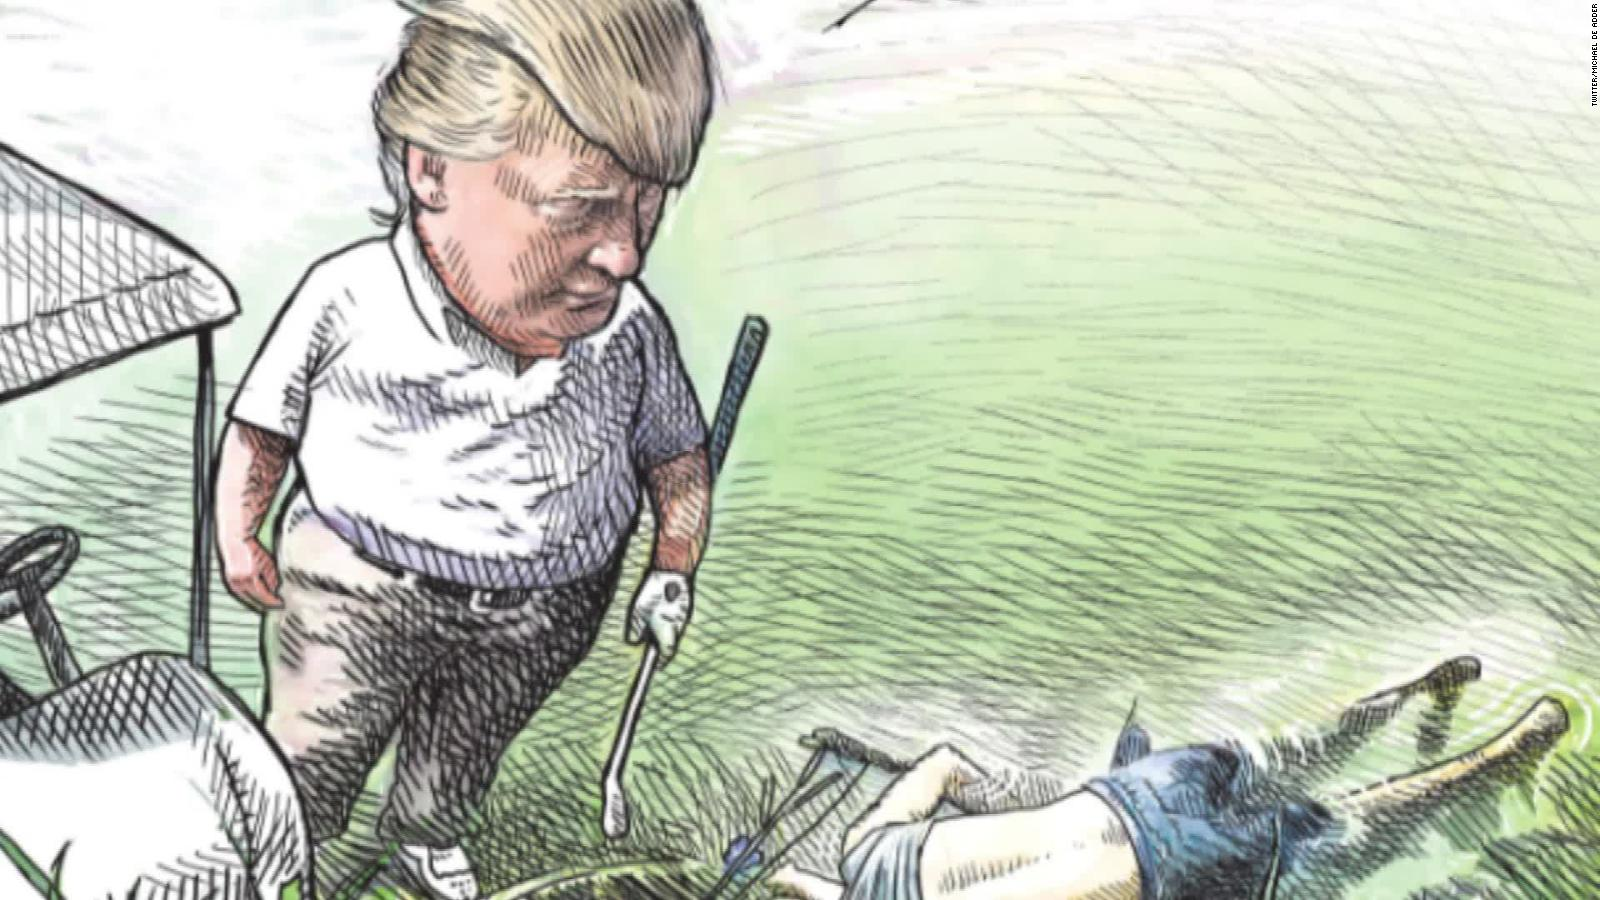 Cartoonist loses job after Trump illustration went viral